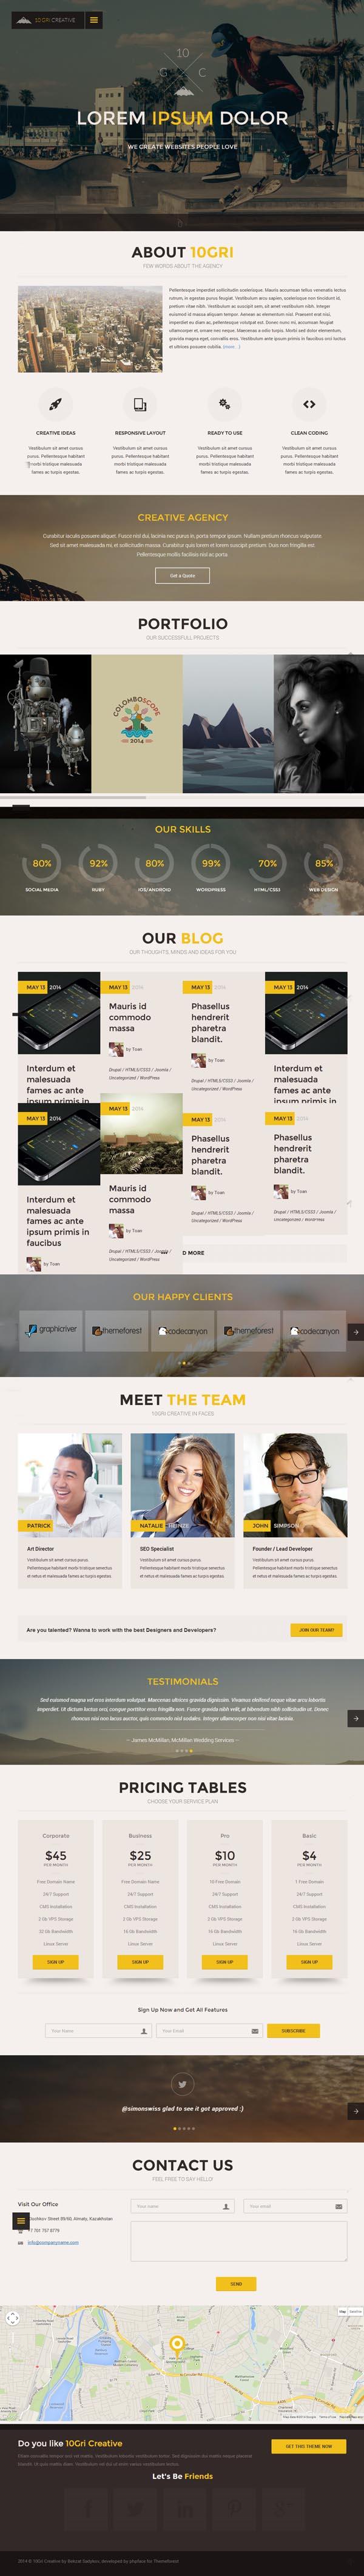 10GriCreative Responsive Onepage WordPress Theme